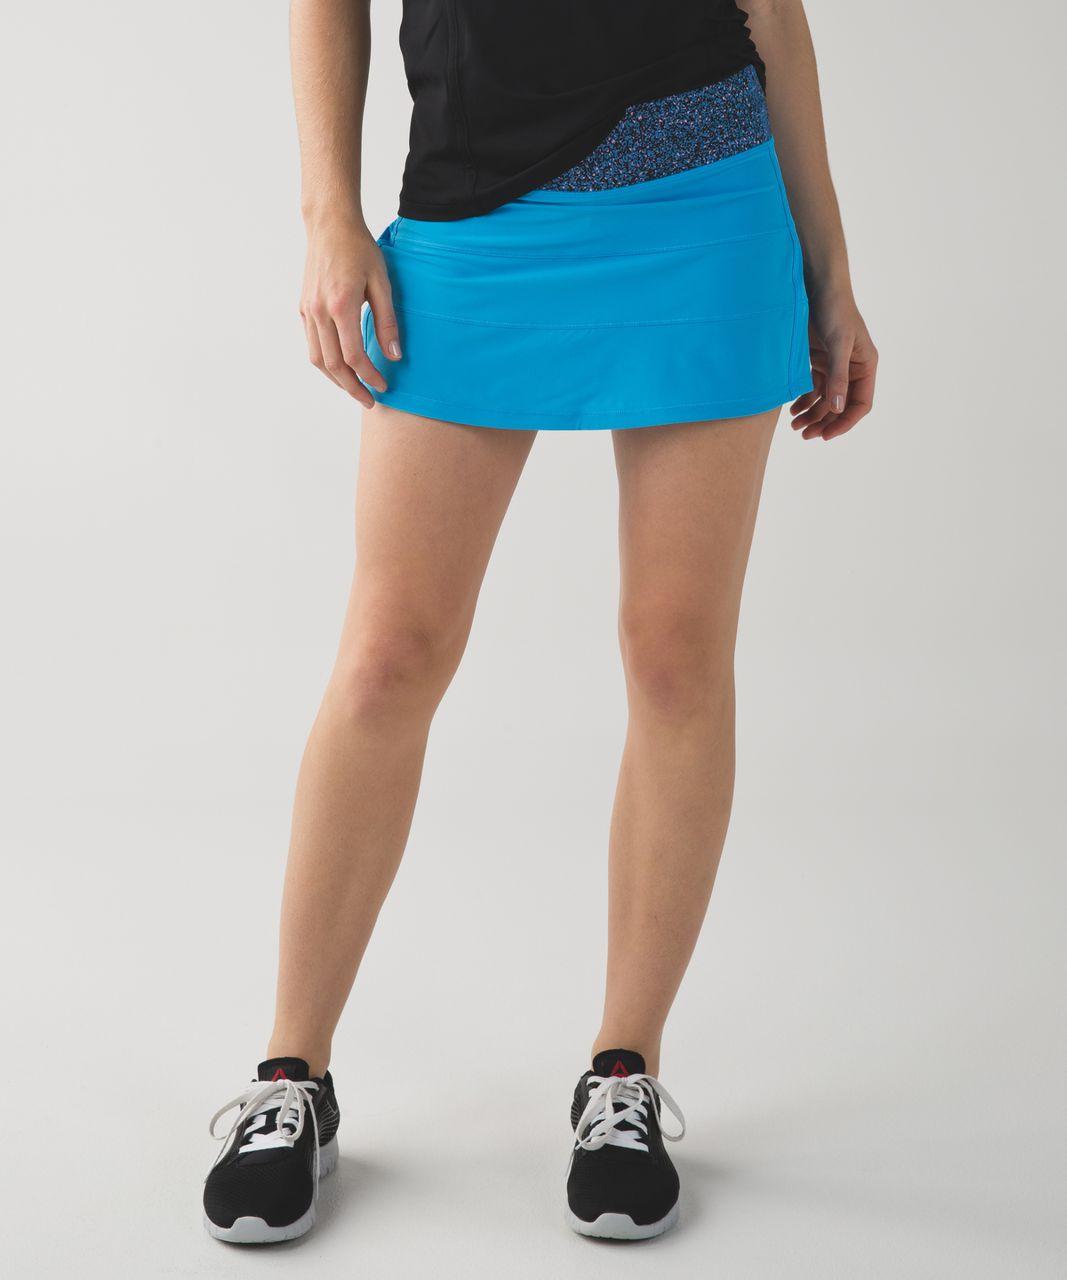 Lululemon Pace Rival Skirt II (Regular) *4-way Stretch - Kayak Blue / Flashback Static Powder Pink Kayak Blue